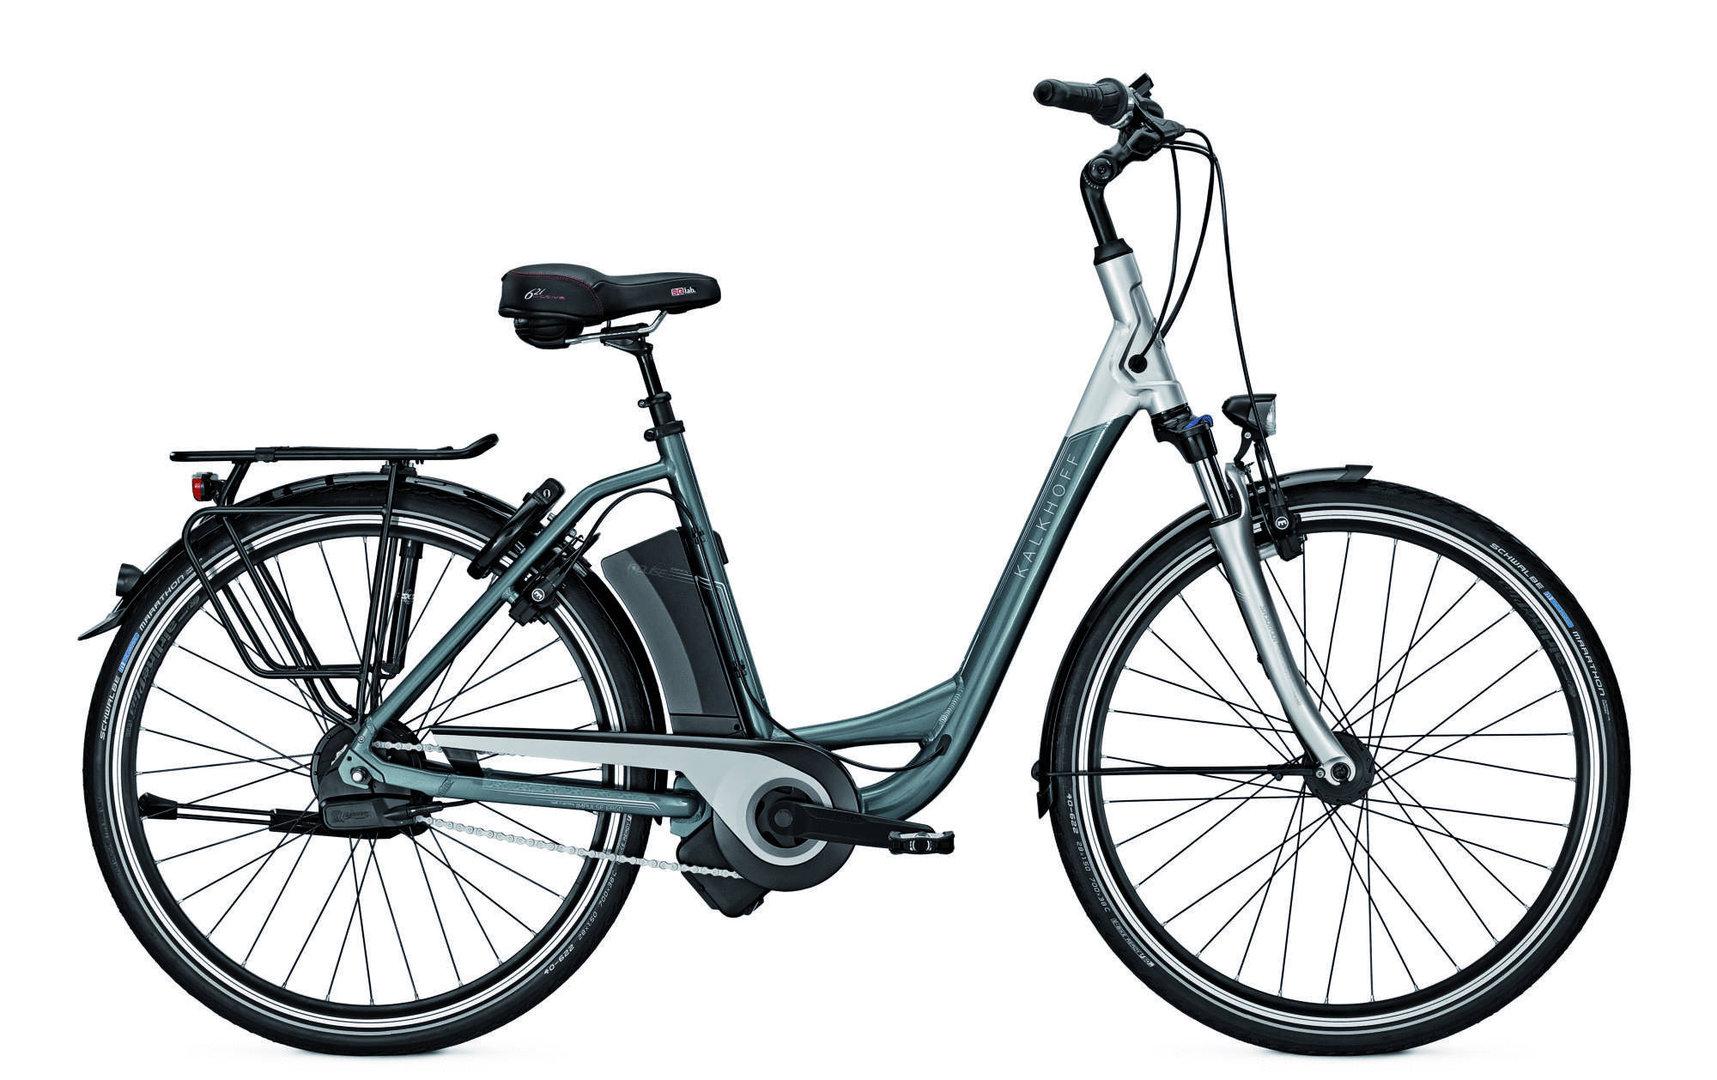 kalkhoff agattu xxl i380 ergo elektro fahrrad city ebike. Black Bedroom Furniture Sets. Home Design Ideas